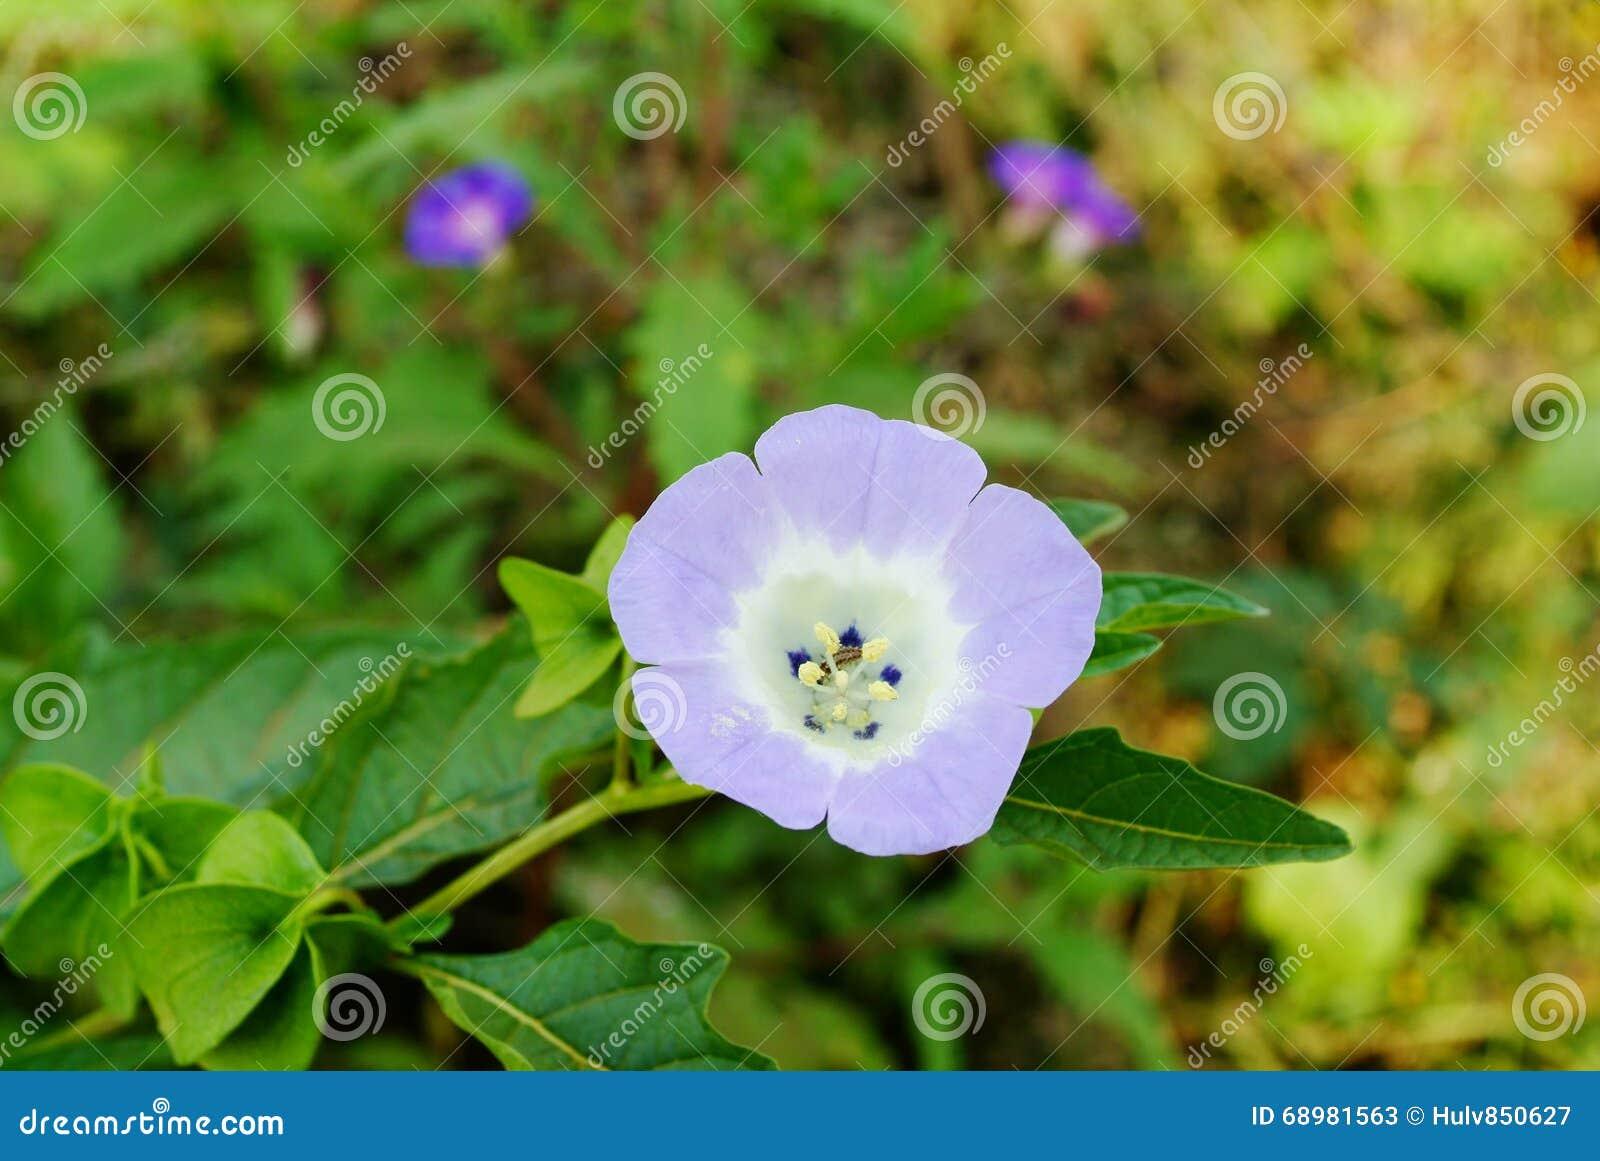 fleur de physalis image stock image du jardin couleur 68981563. Black Bedroom Furniture Sets. Home Design Ideas